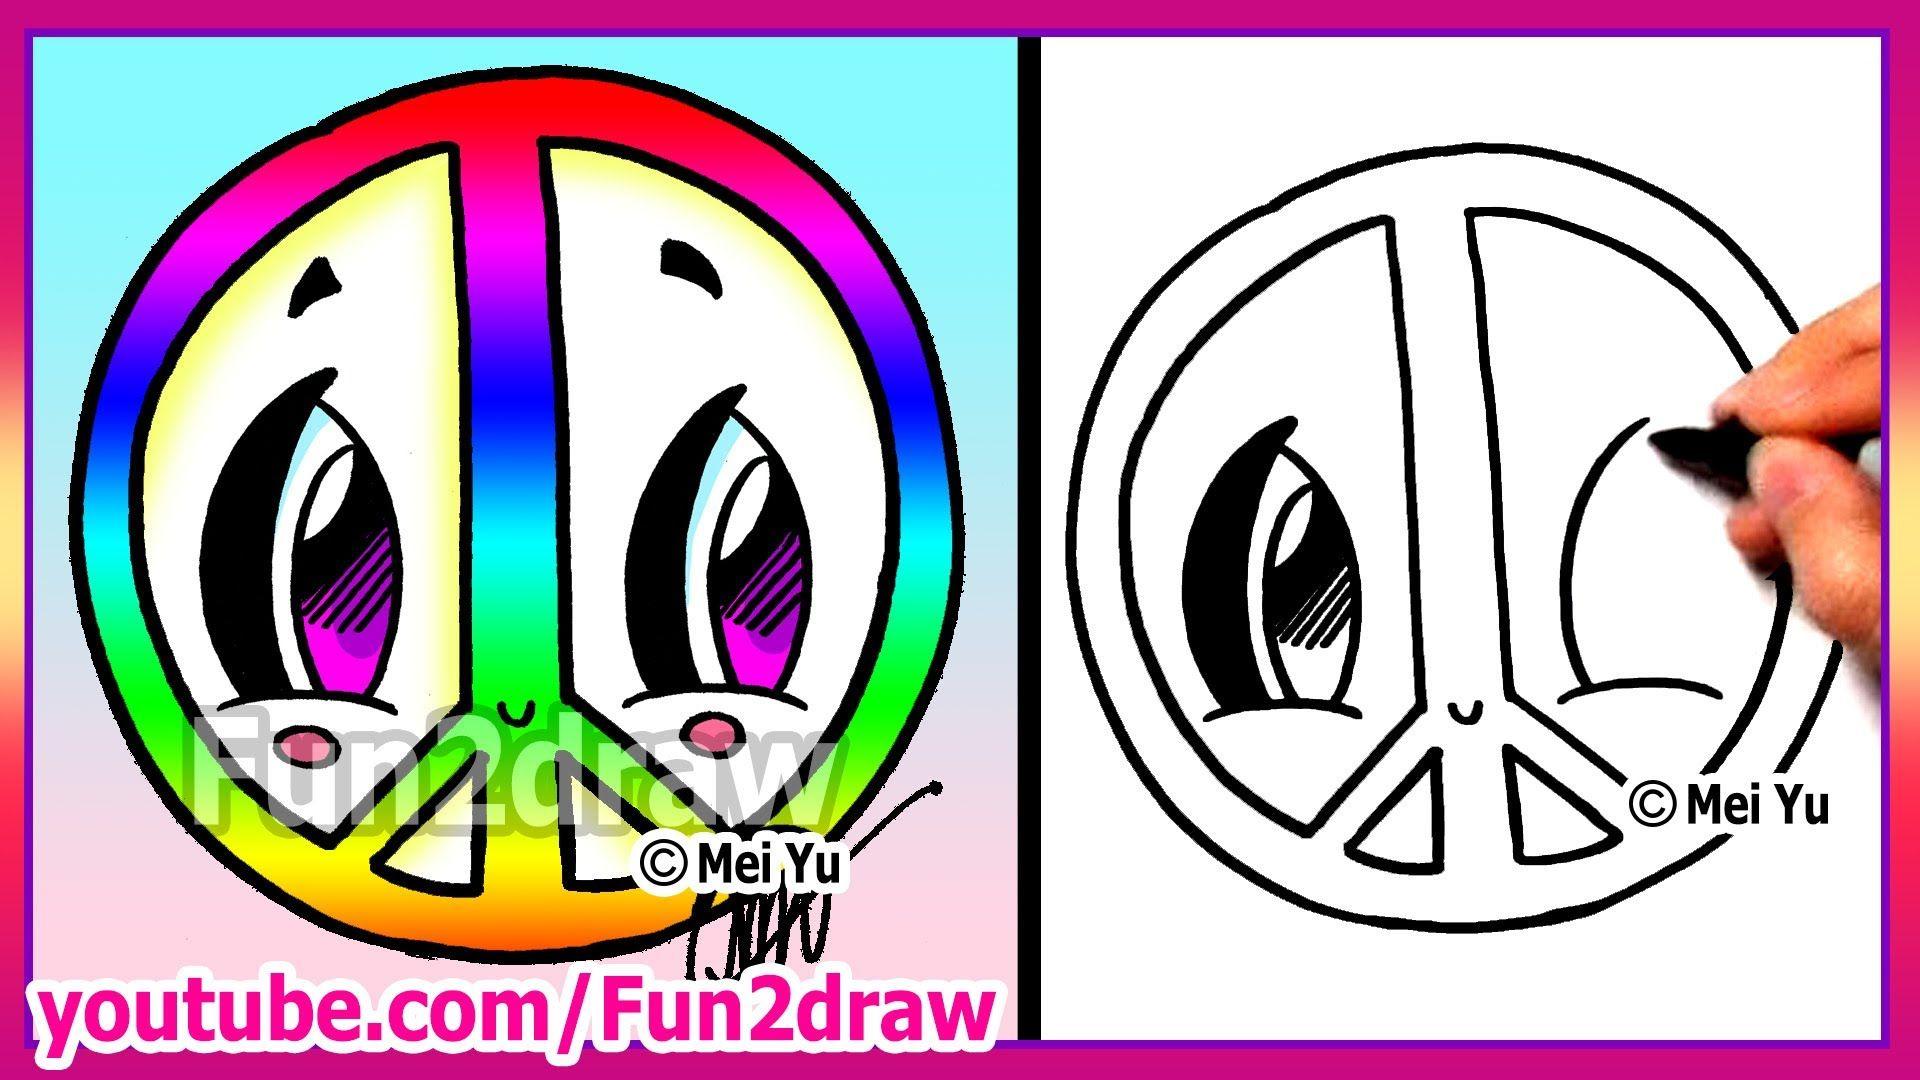 17 B Sta Bilder Om Fun 2 Draw Fan P Pinterest Tecknad Serie Chibi Och  Youtube